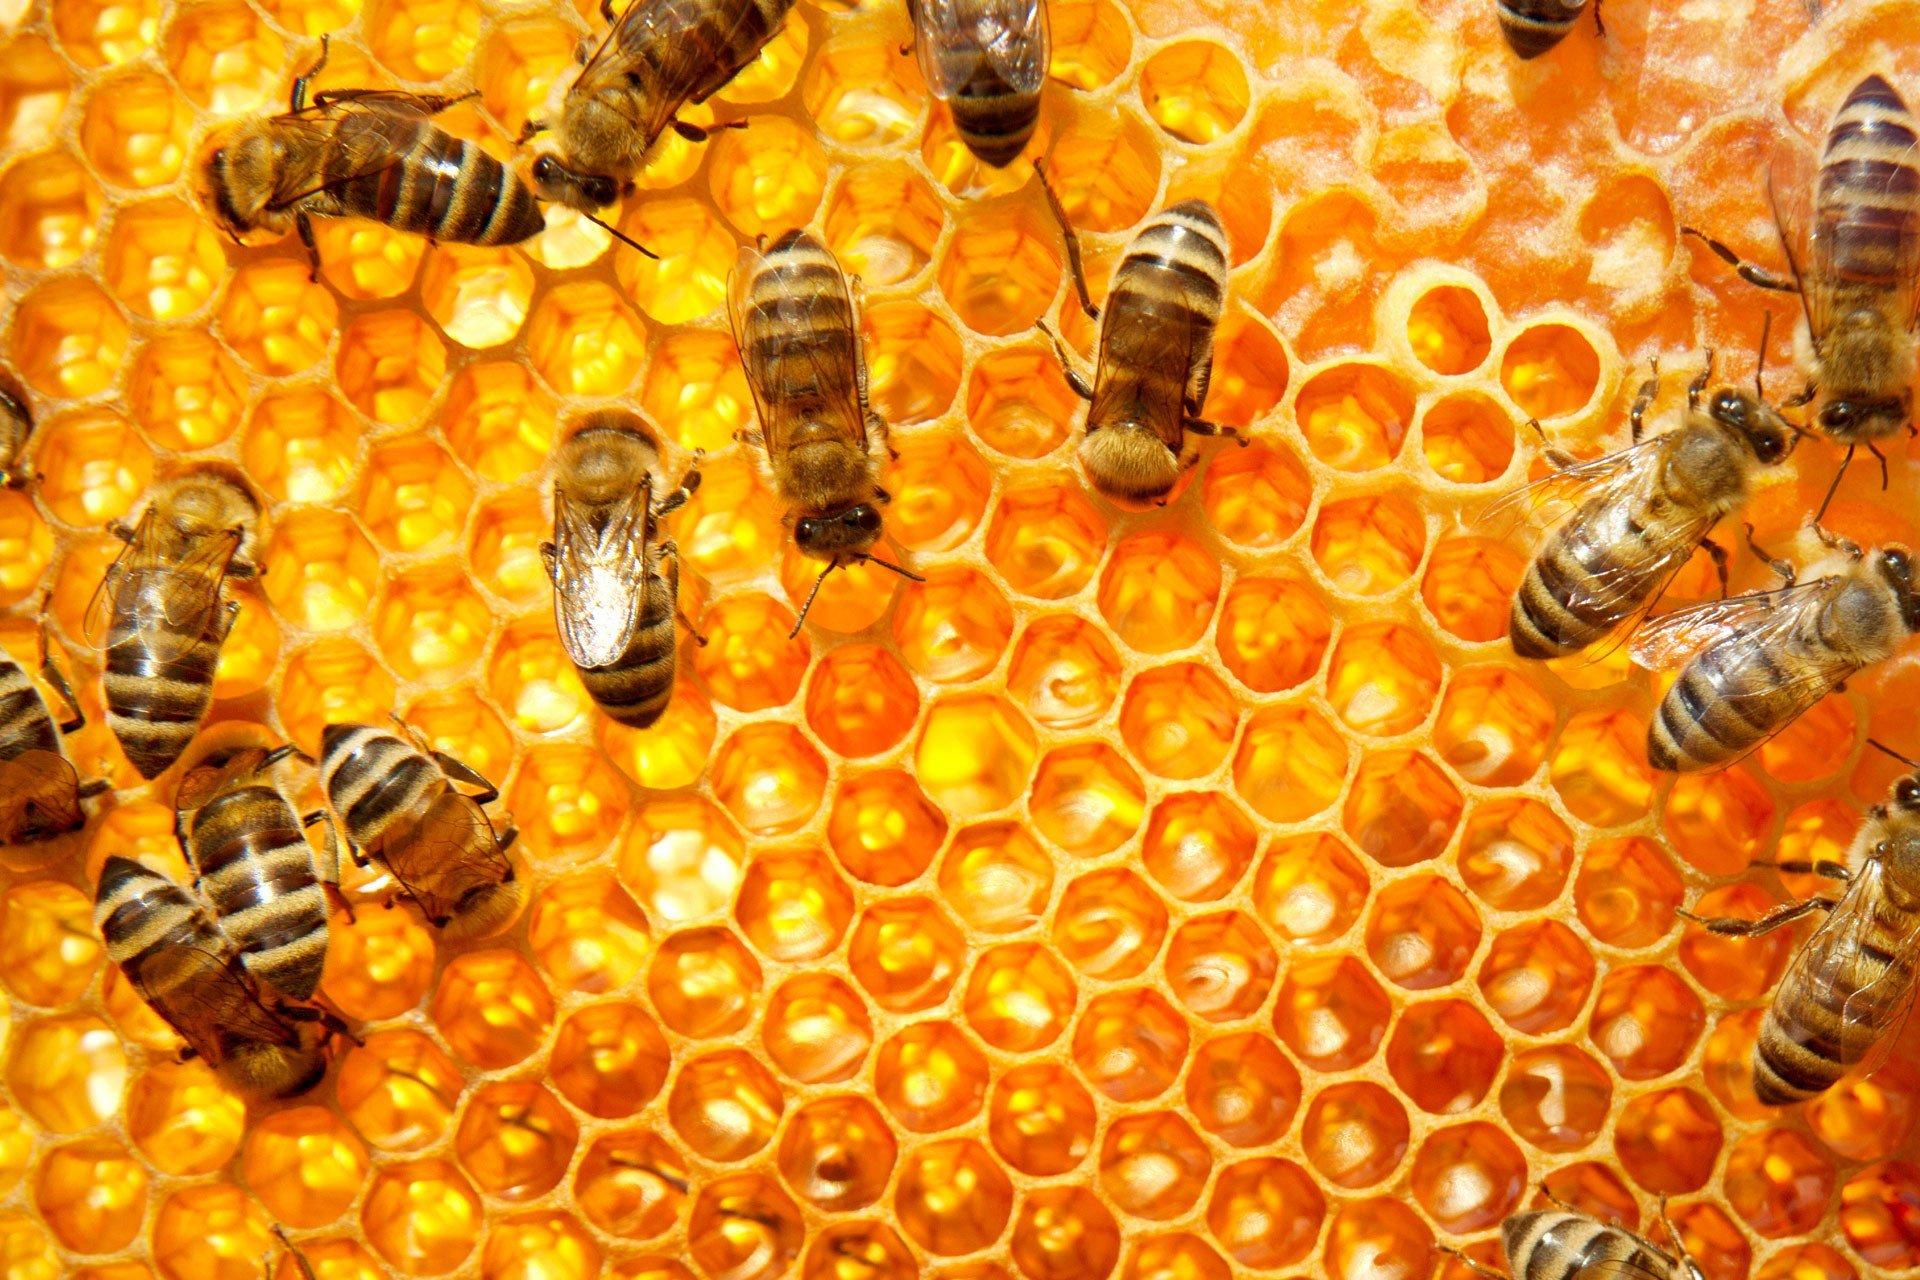 「BEE」的圖片搜尋結果